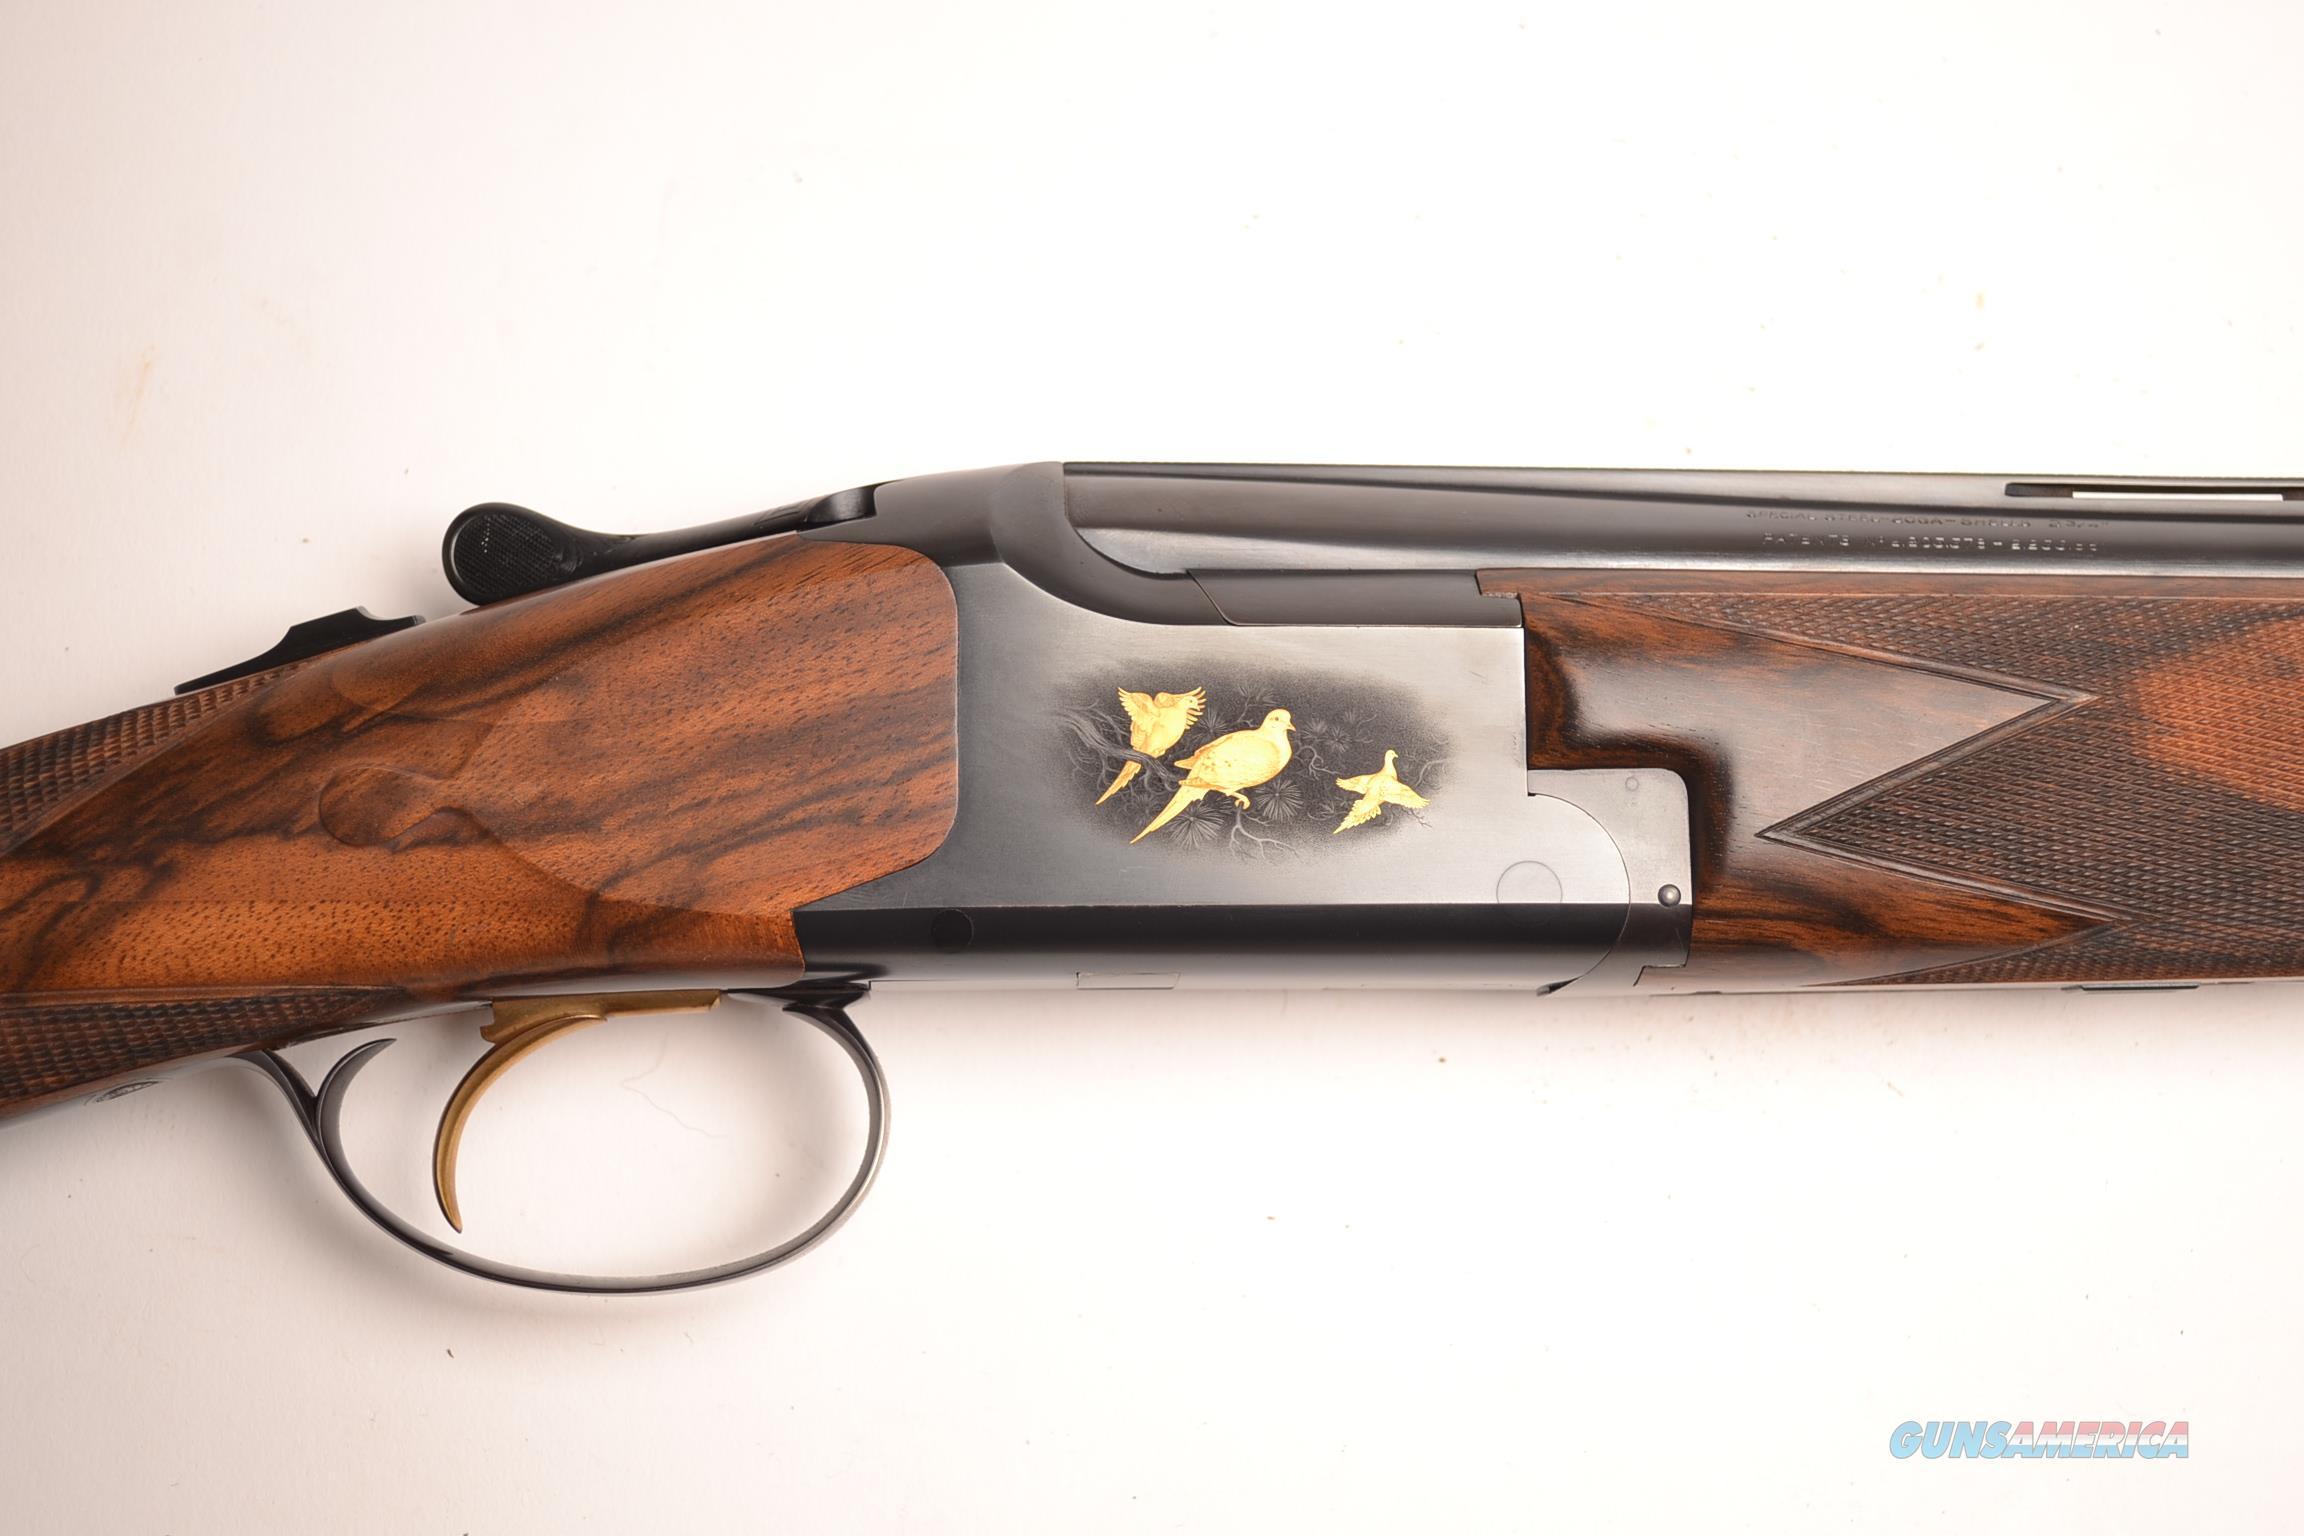 Browning - Churchill Engraved Superlight  Guns > Shotguns > Browning Shotguns > Over Unders > Belgian Manufacture